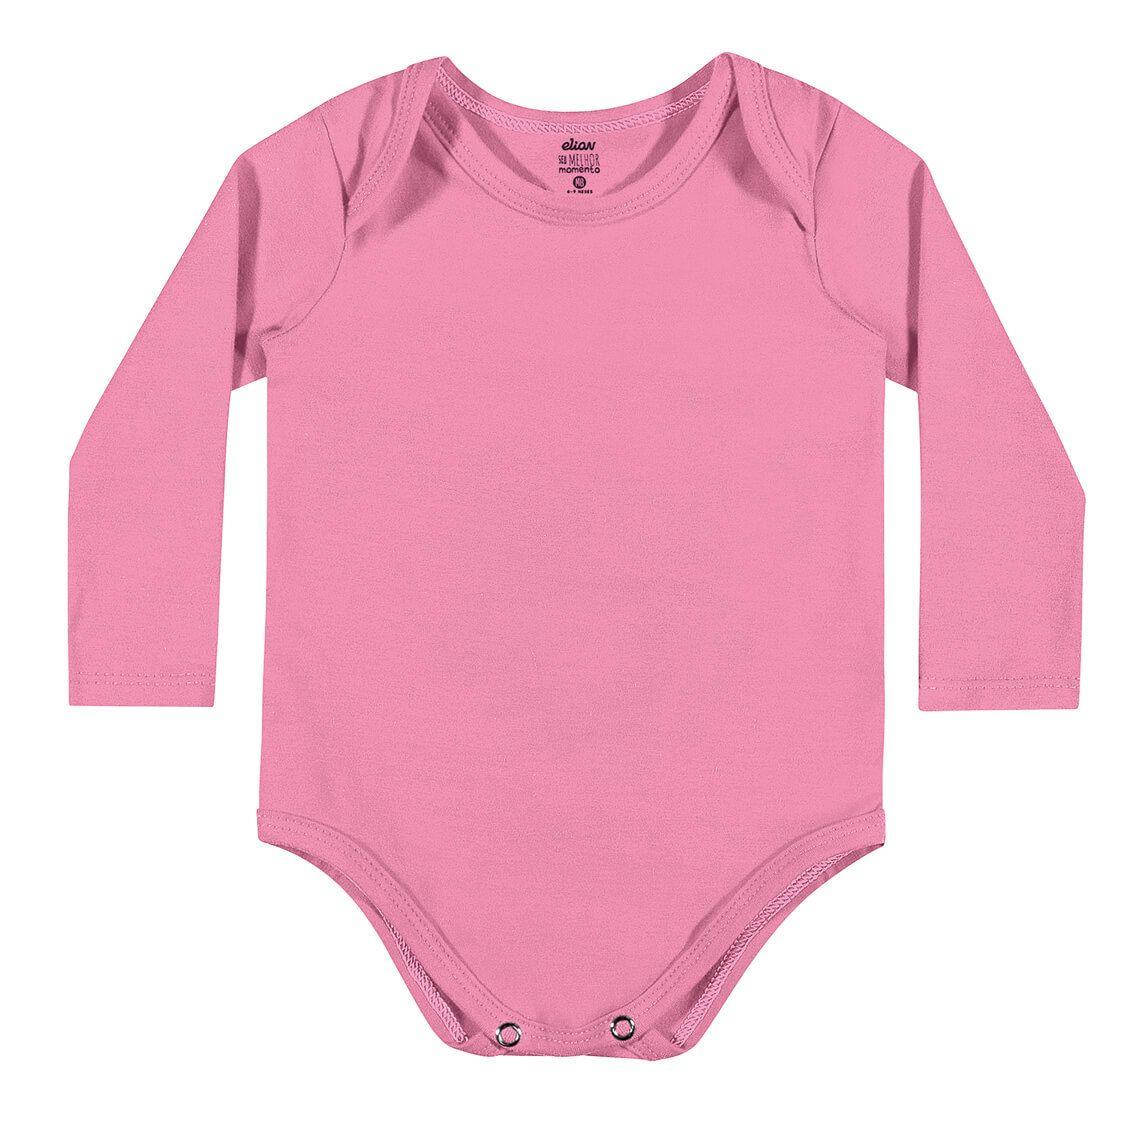 Body Infantil Feminino Inverno Rosa Elian